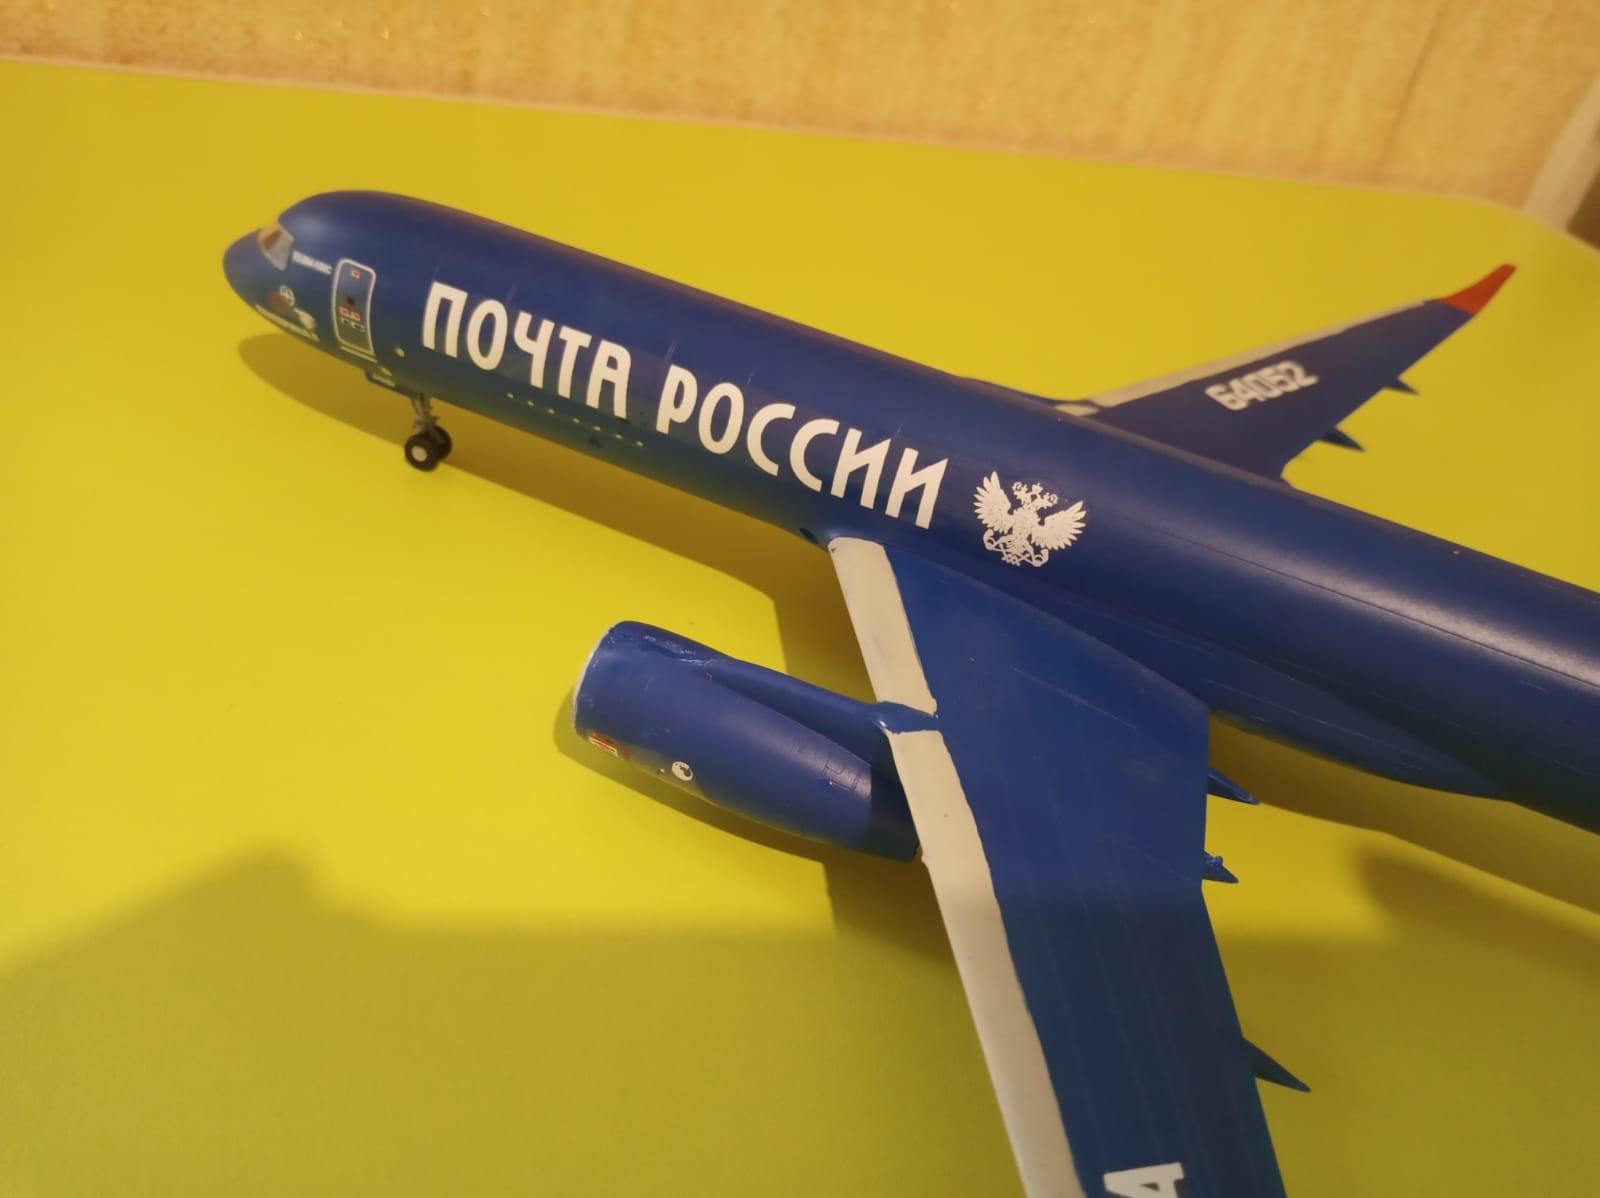 7022 Ту-204 Почта России Звезда, 1/144 Img-20210826-wa0008